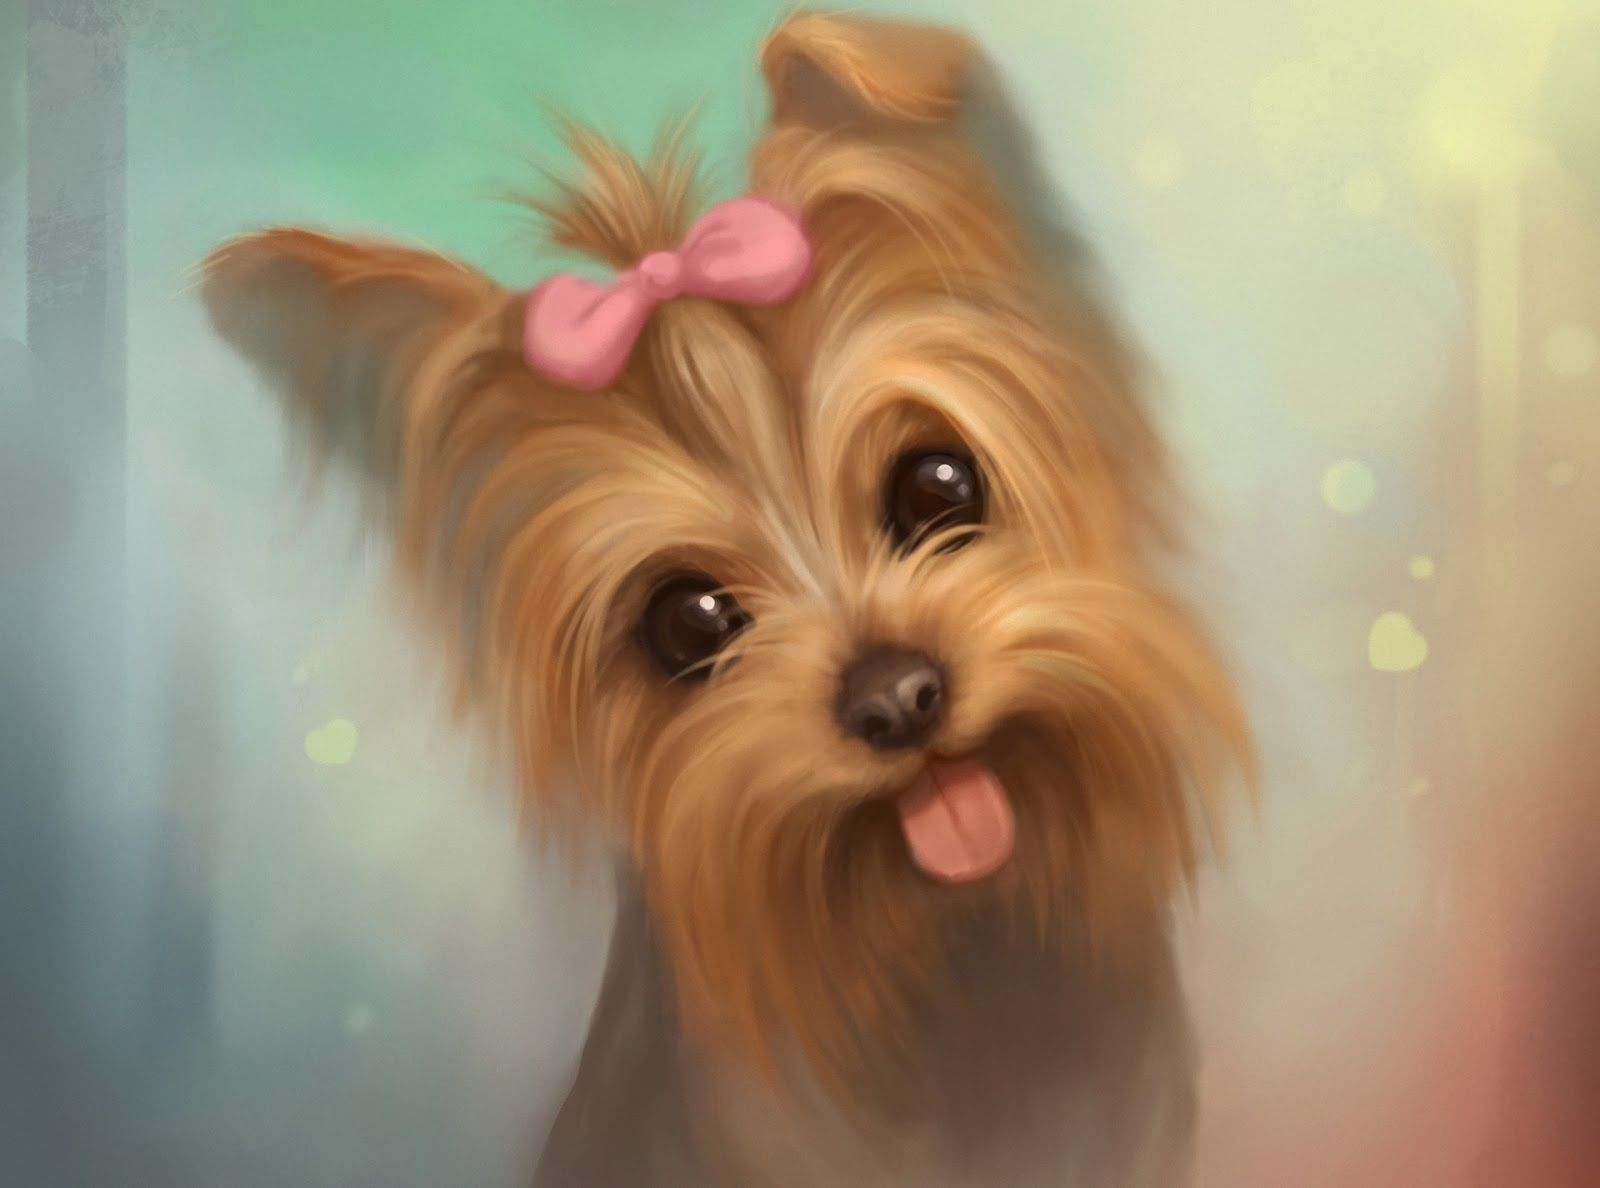 Cute Puppy Wallpapers For Desktop Cute Puppy Wallpaper Yorkie Dogs Puppy Wallpaper